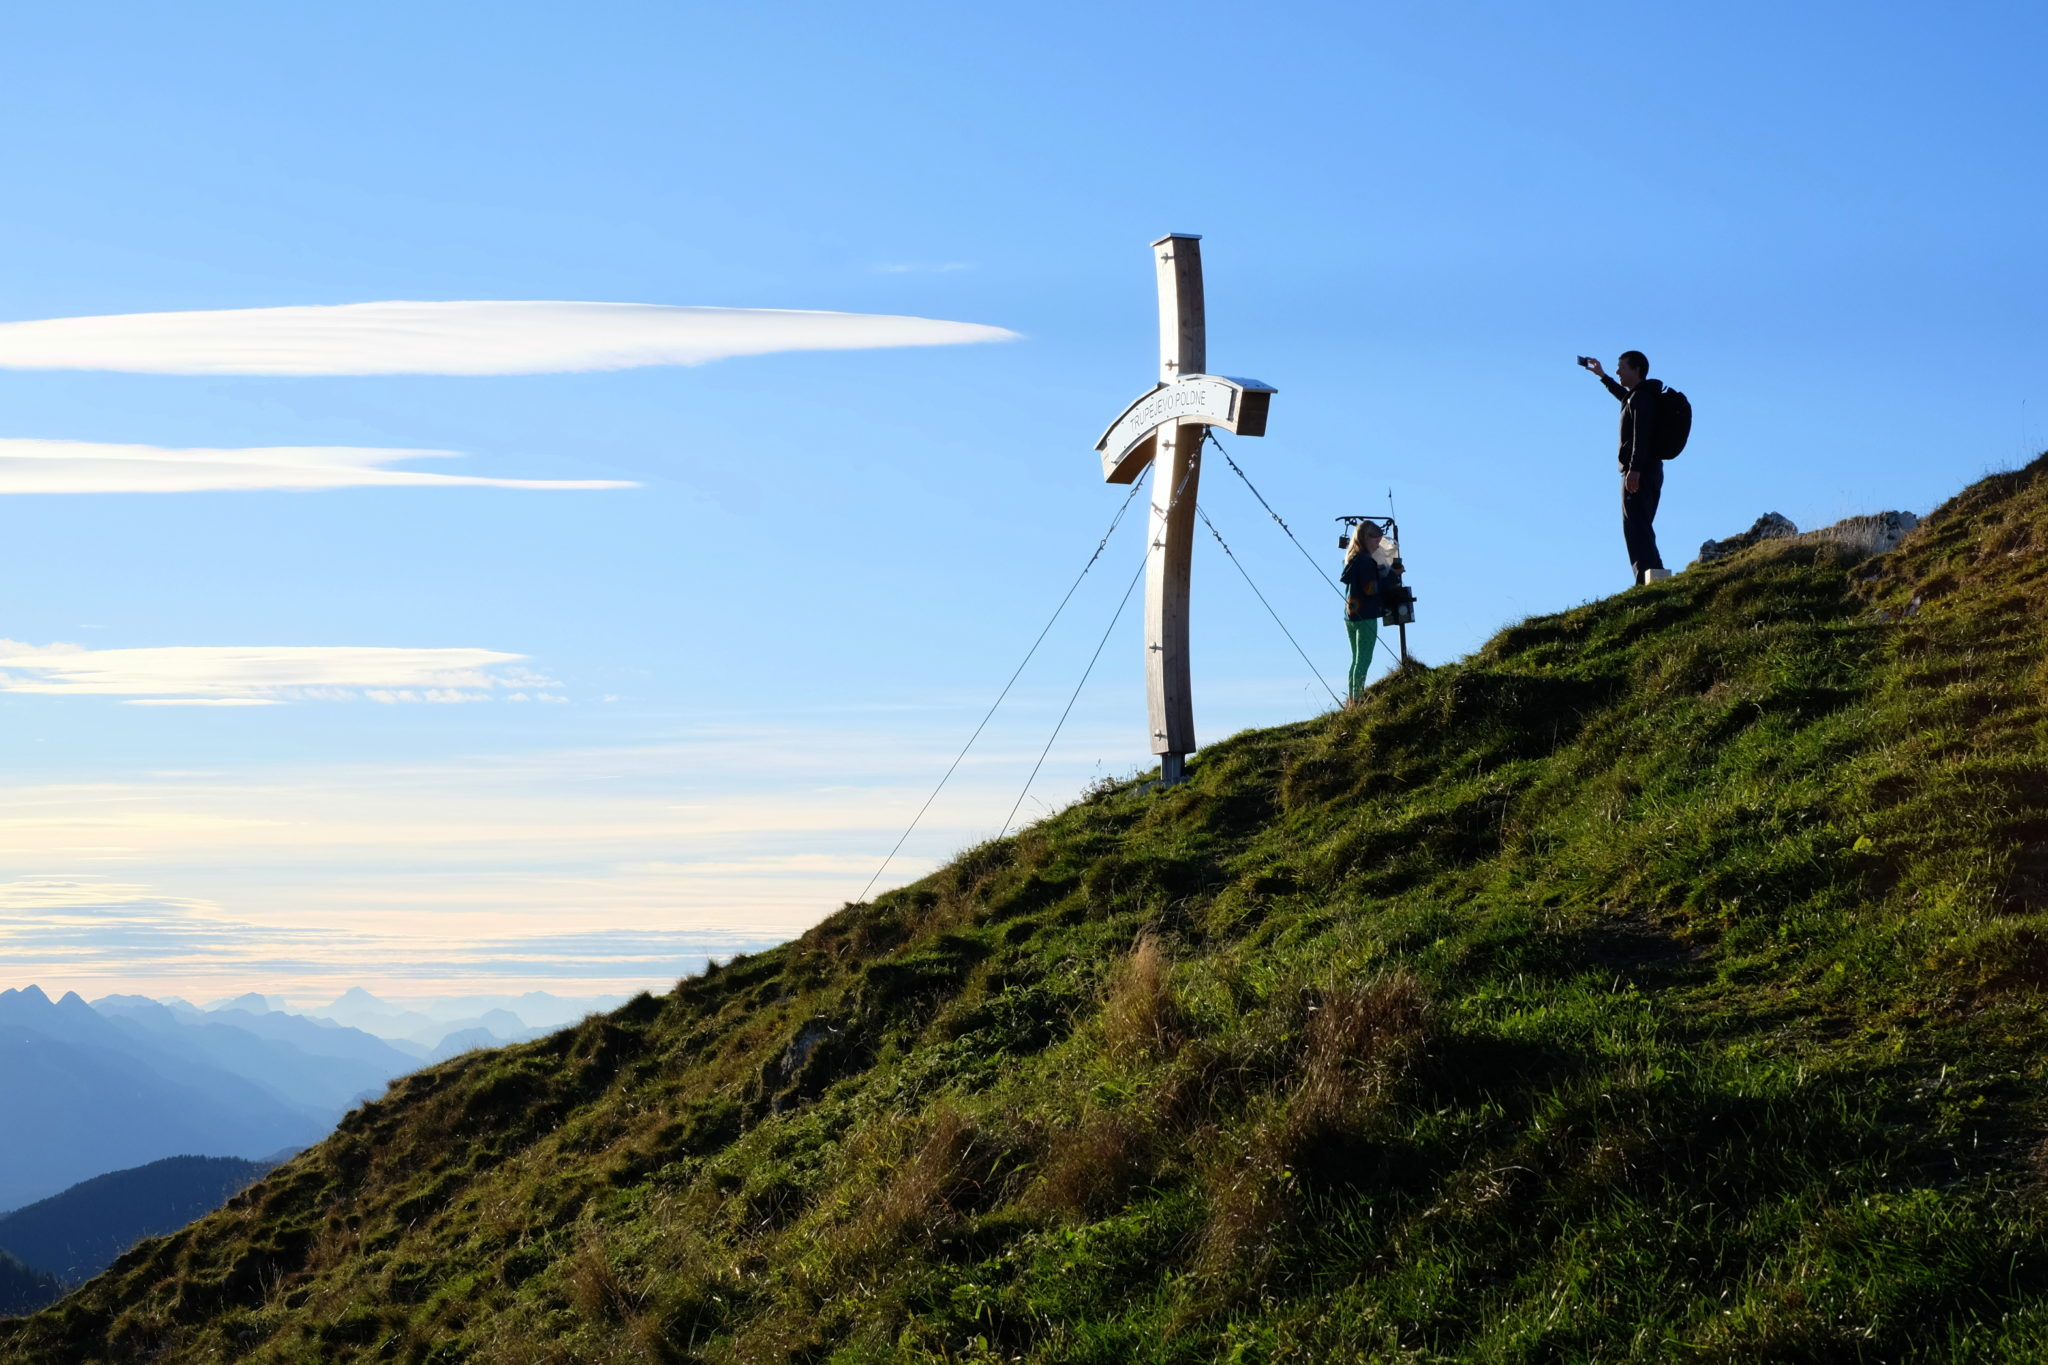 Trupejevo Poldne, 1,931 m, Karawanks, Slovenia